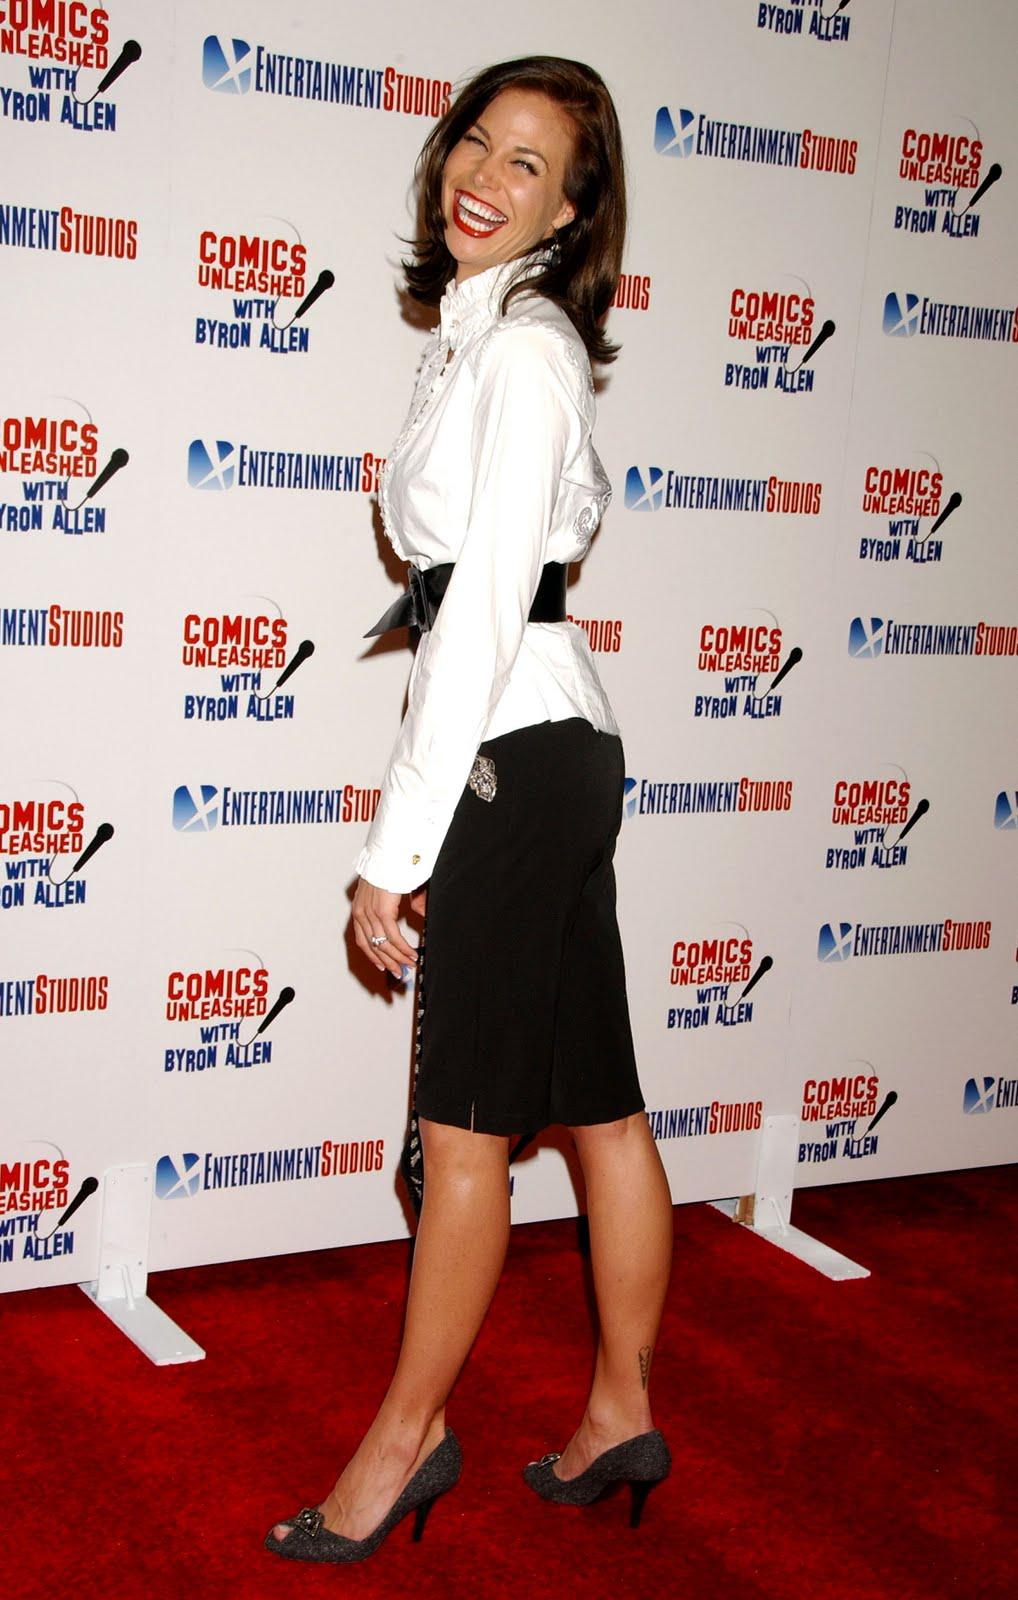 1000+ images about Brooke Burns on Pinterest |Shorts Brooke Burns